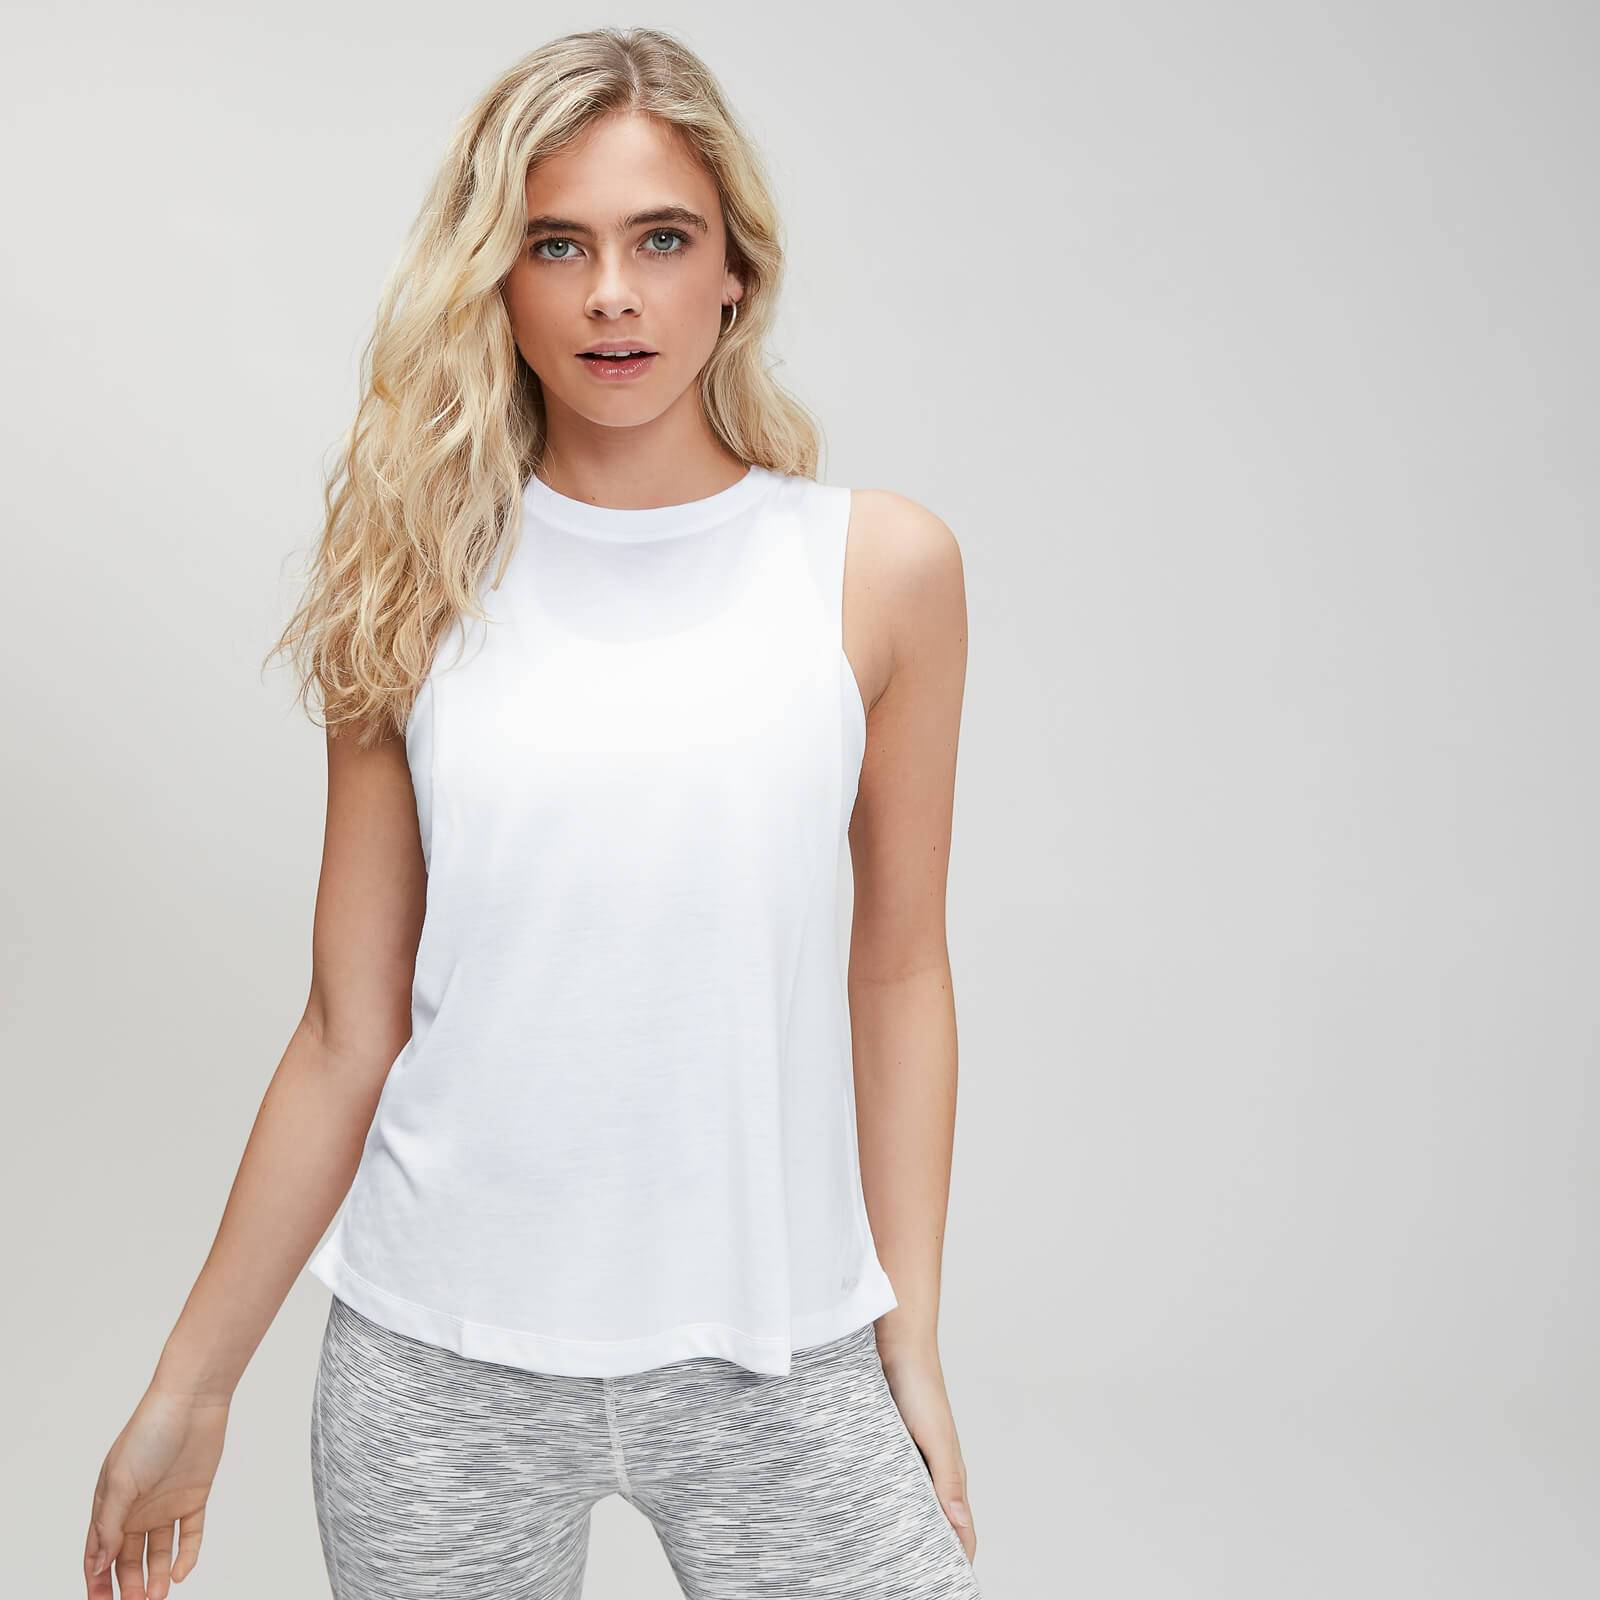 Mp Camiseta sin mangas con sisas caídas Essentials Training para mujer de  - Blanco - XL